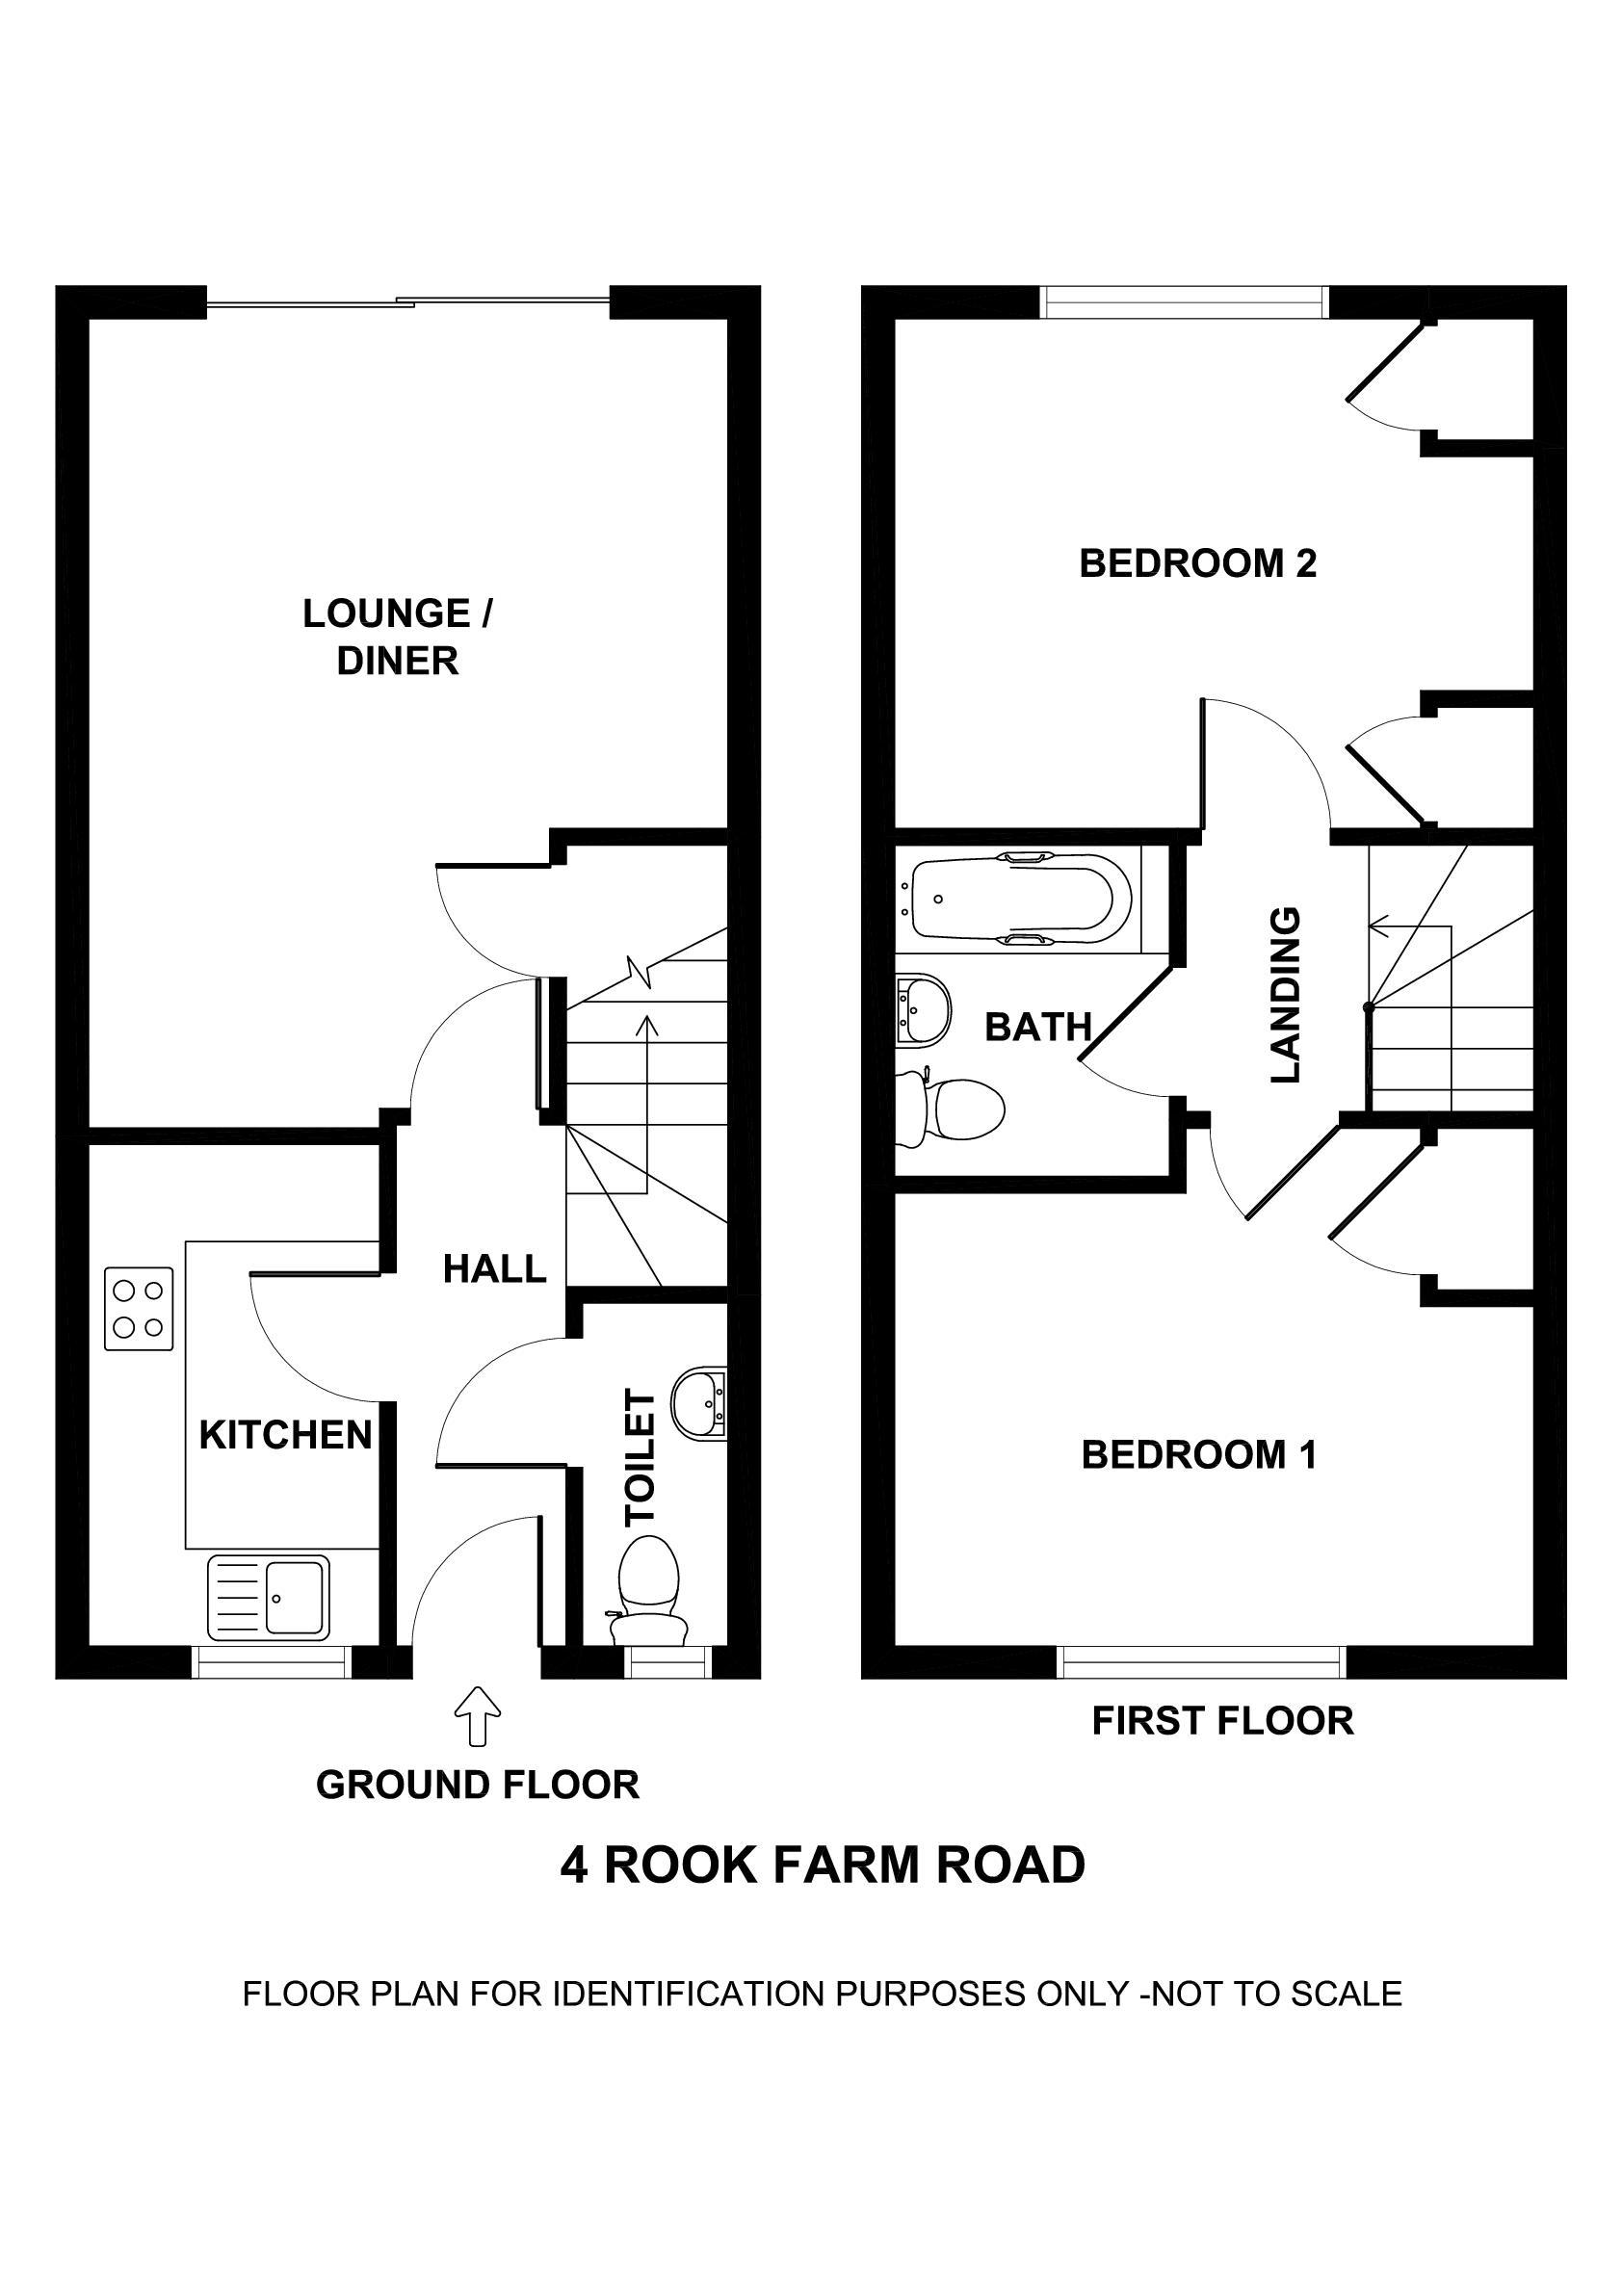 Rook Farm Way